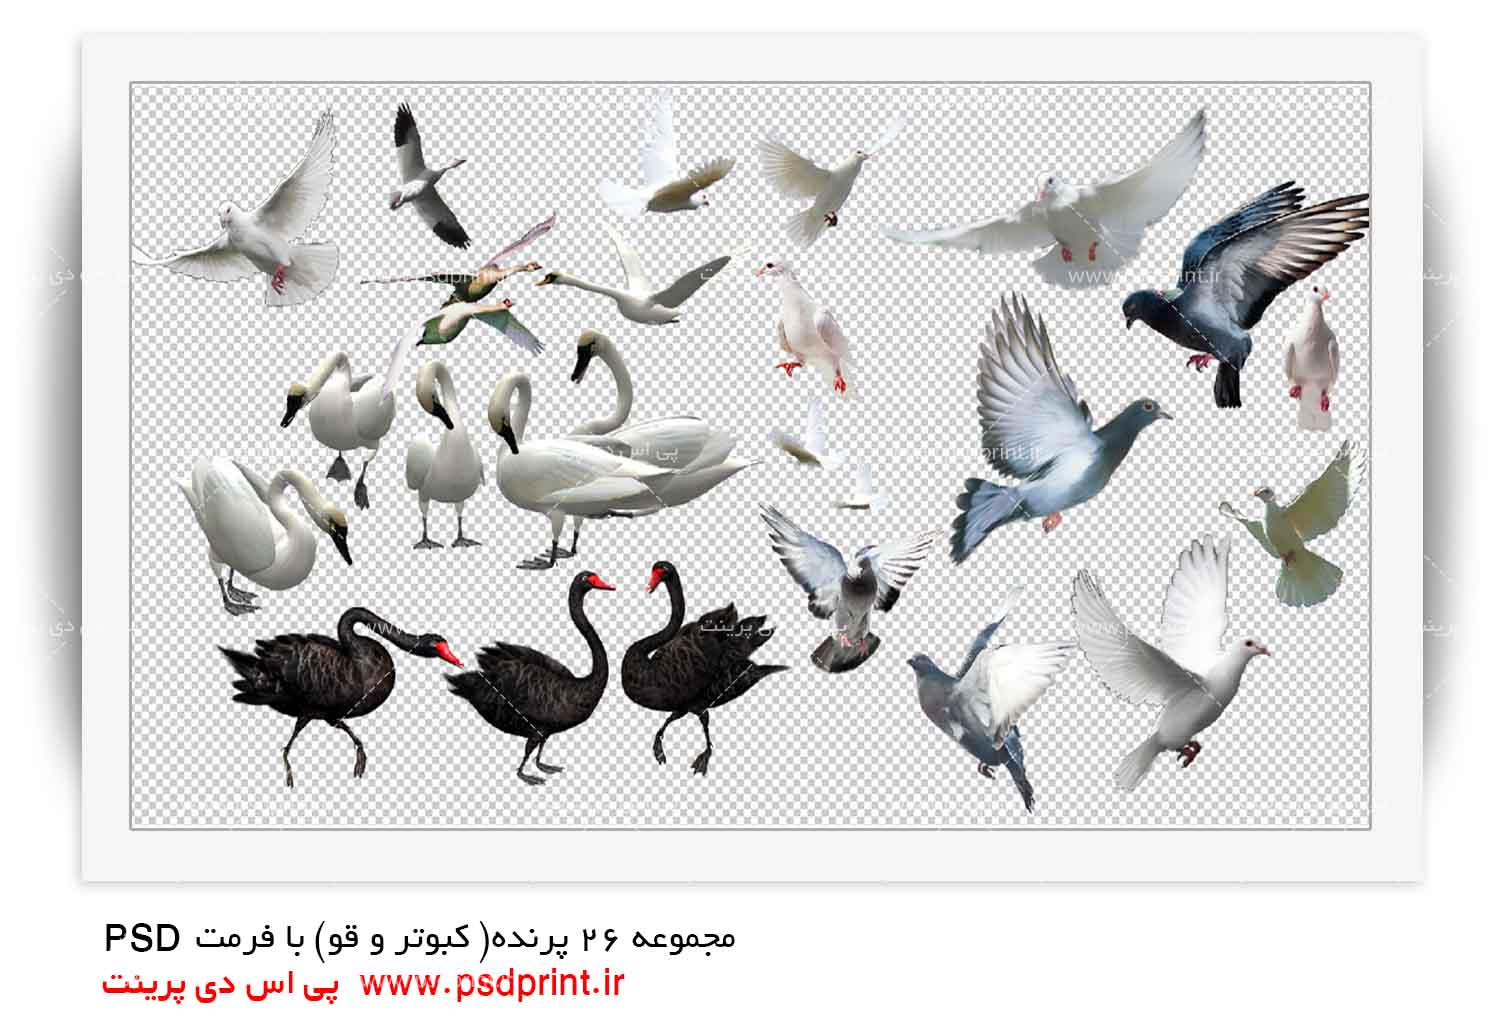 کبوتر+png